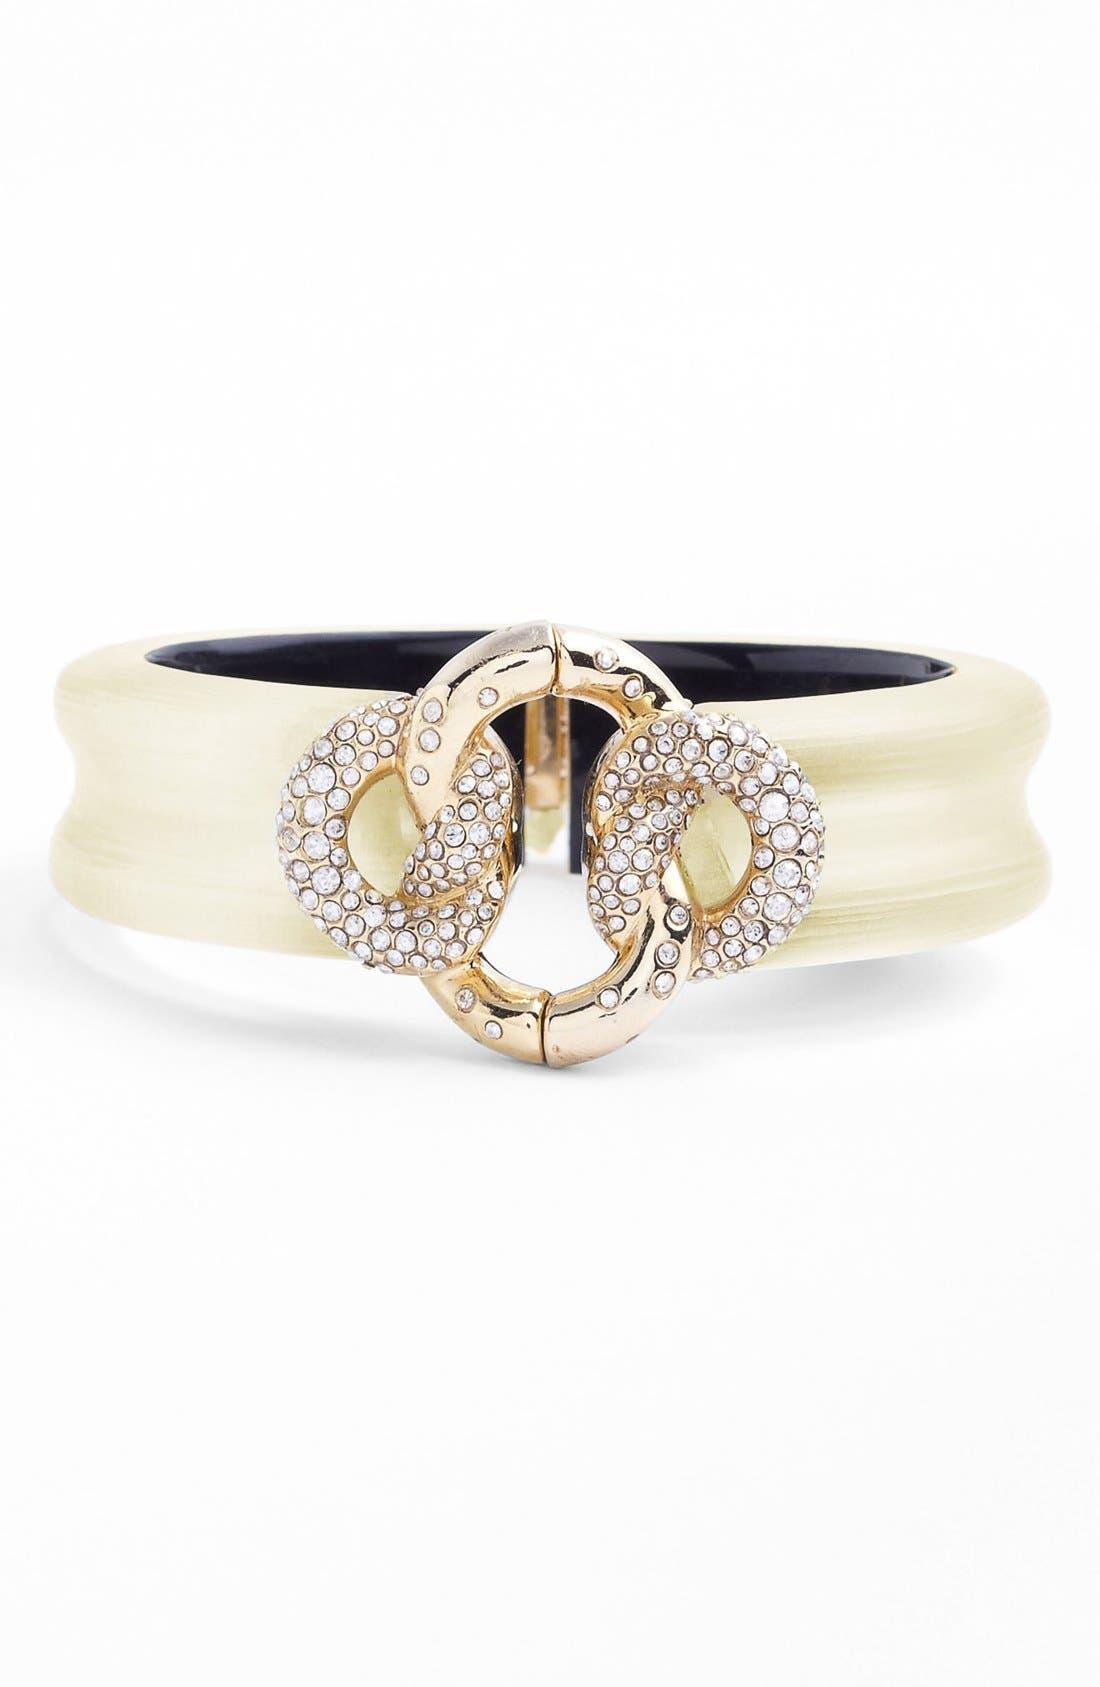 Main Image - Alexis Bittar 'Lucite® - Mod' Knot Bracelet